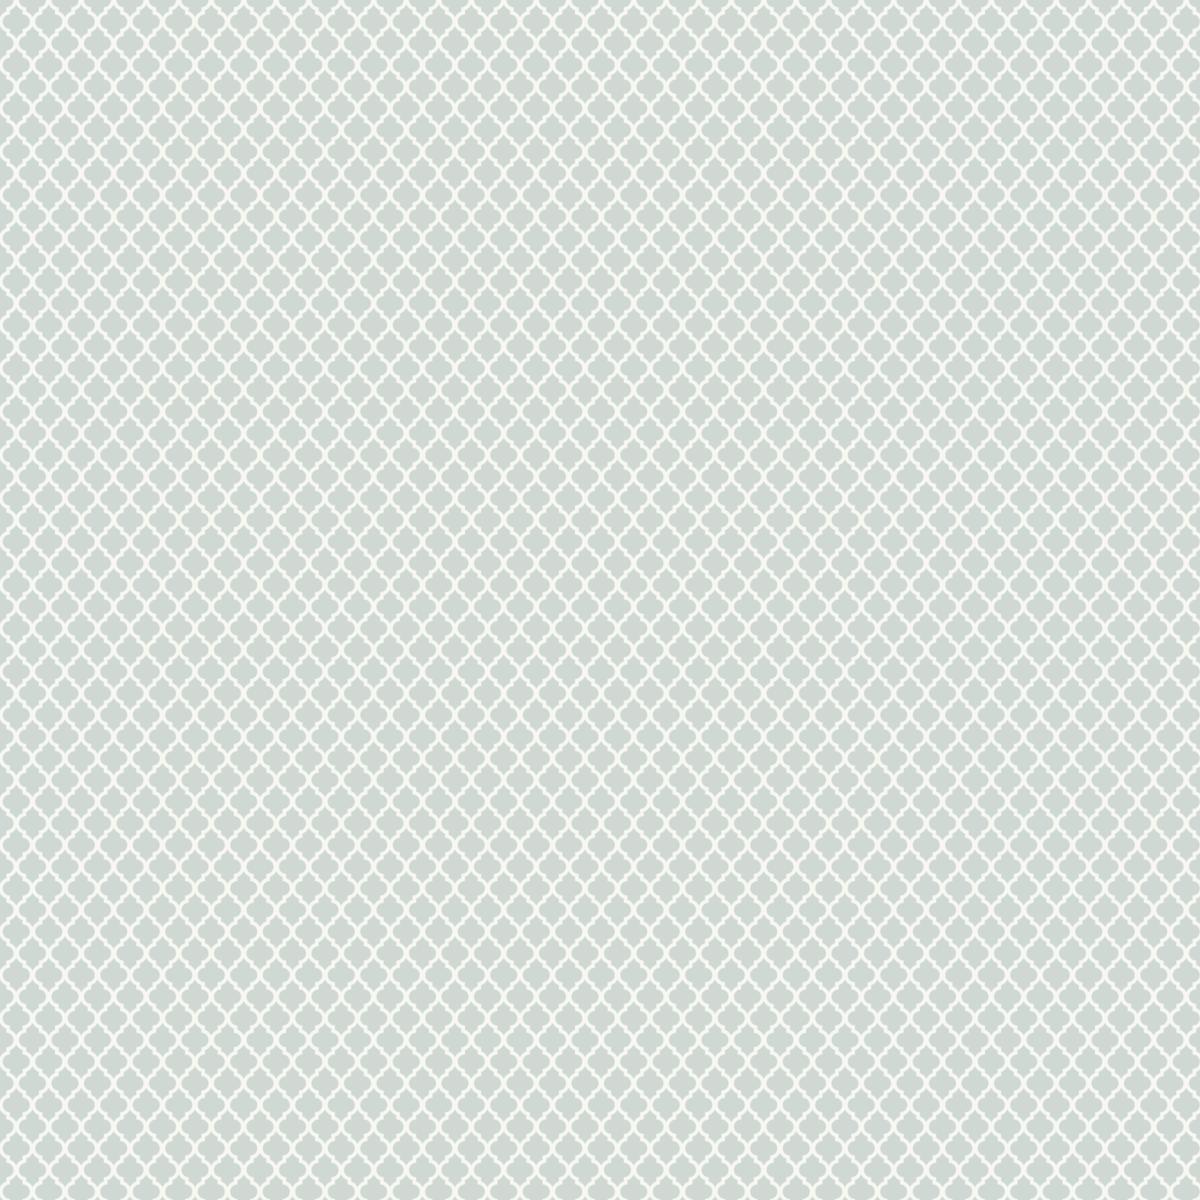 1200x1200px Gray Quatrefoil Wallpaper Wallpapersafari